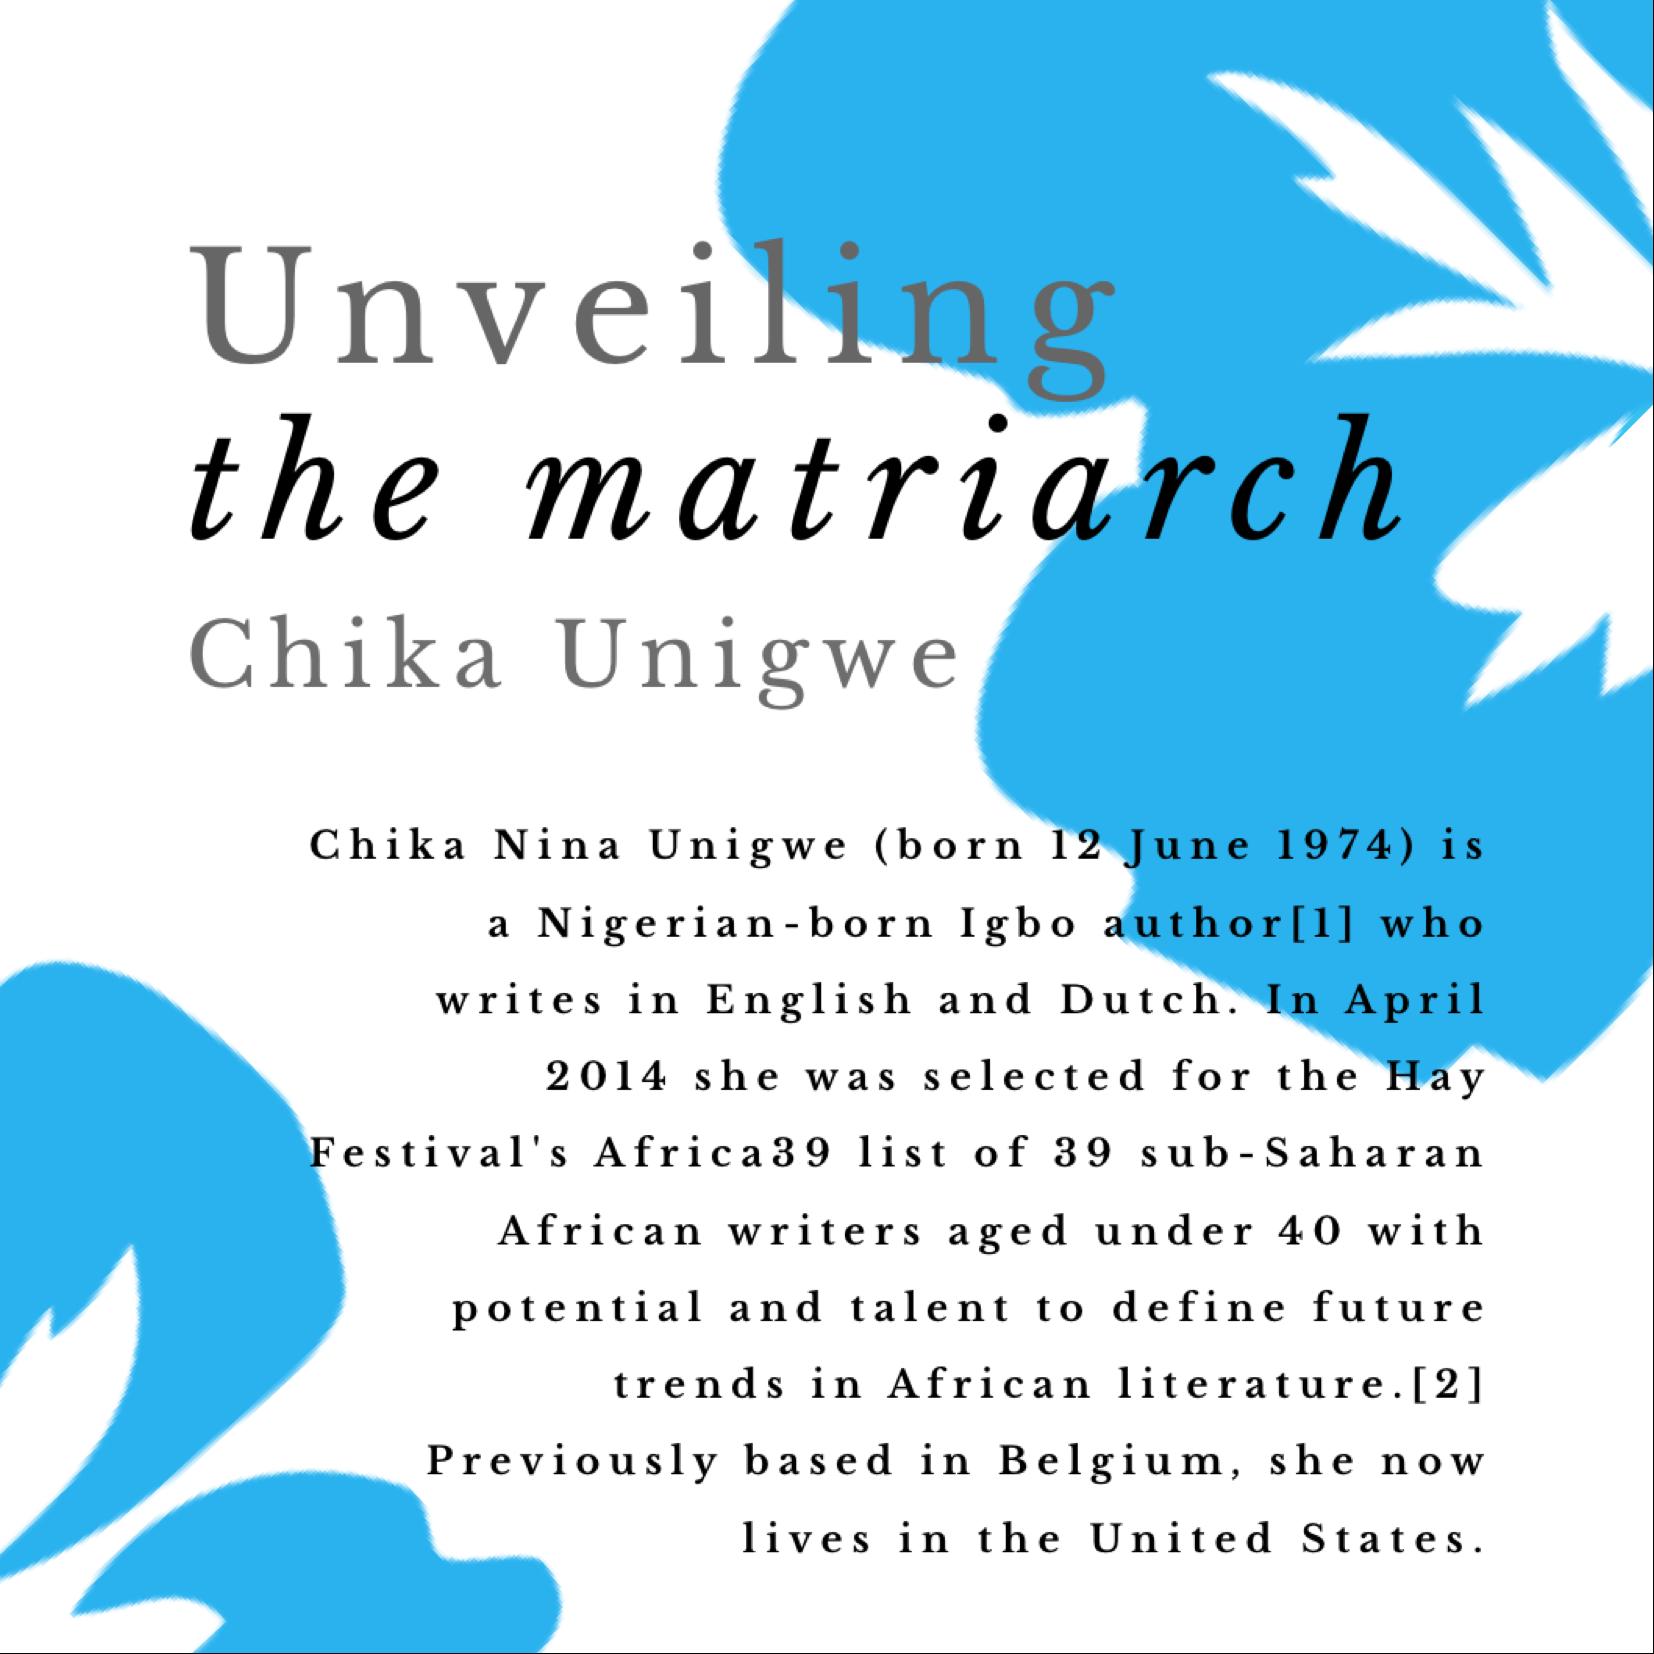 Chika Unigwe on Torie's blog